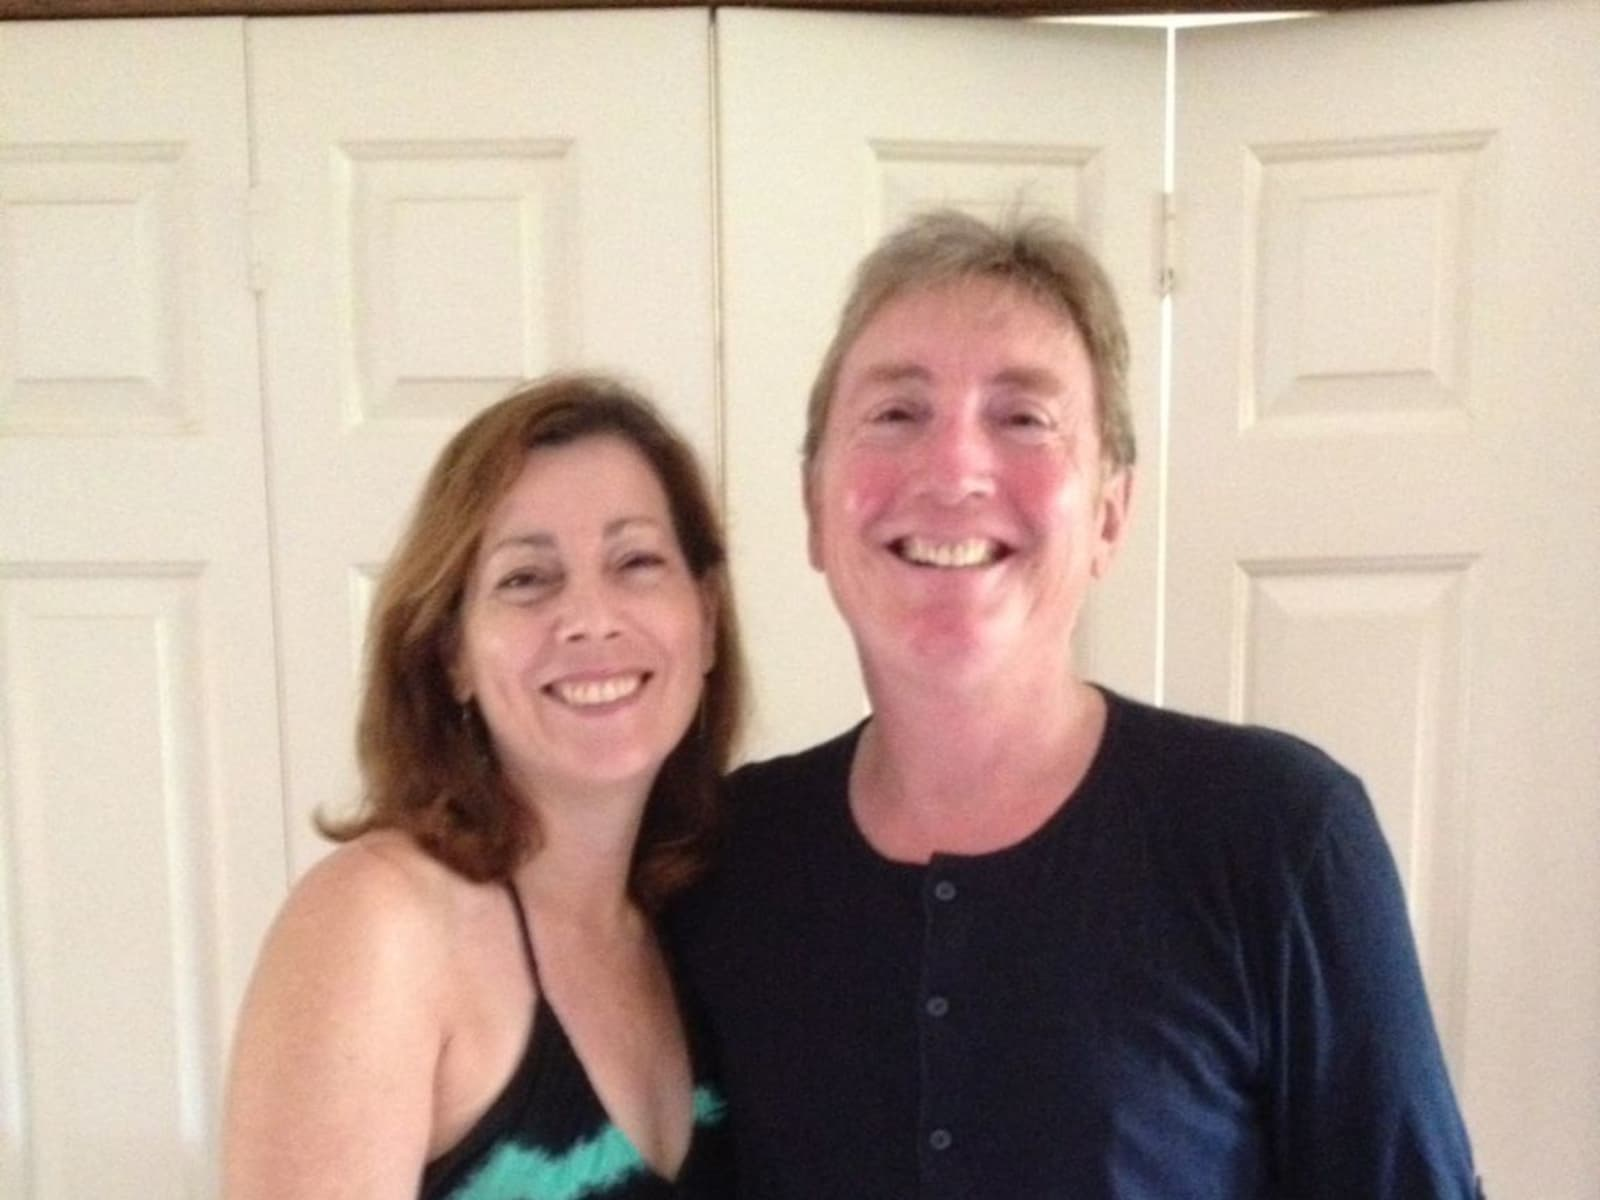 Vicki & Steve from Sydney, New South Wales, Australia